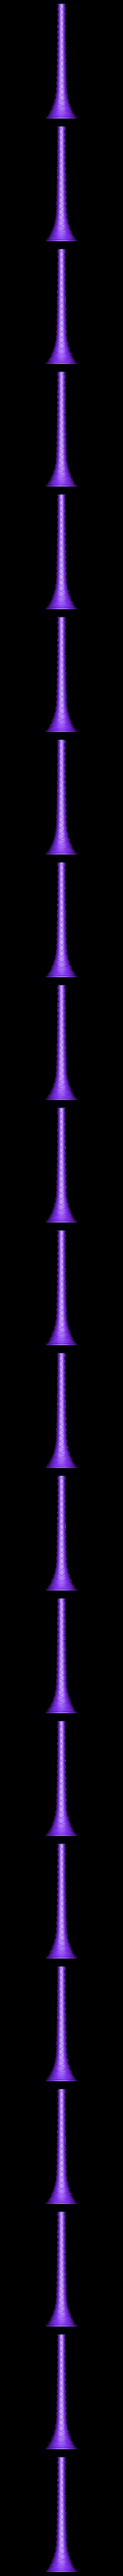 trompe.stl Download free STL file Music Trumpet • 3D printable object, MathieuM3D